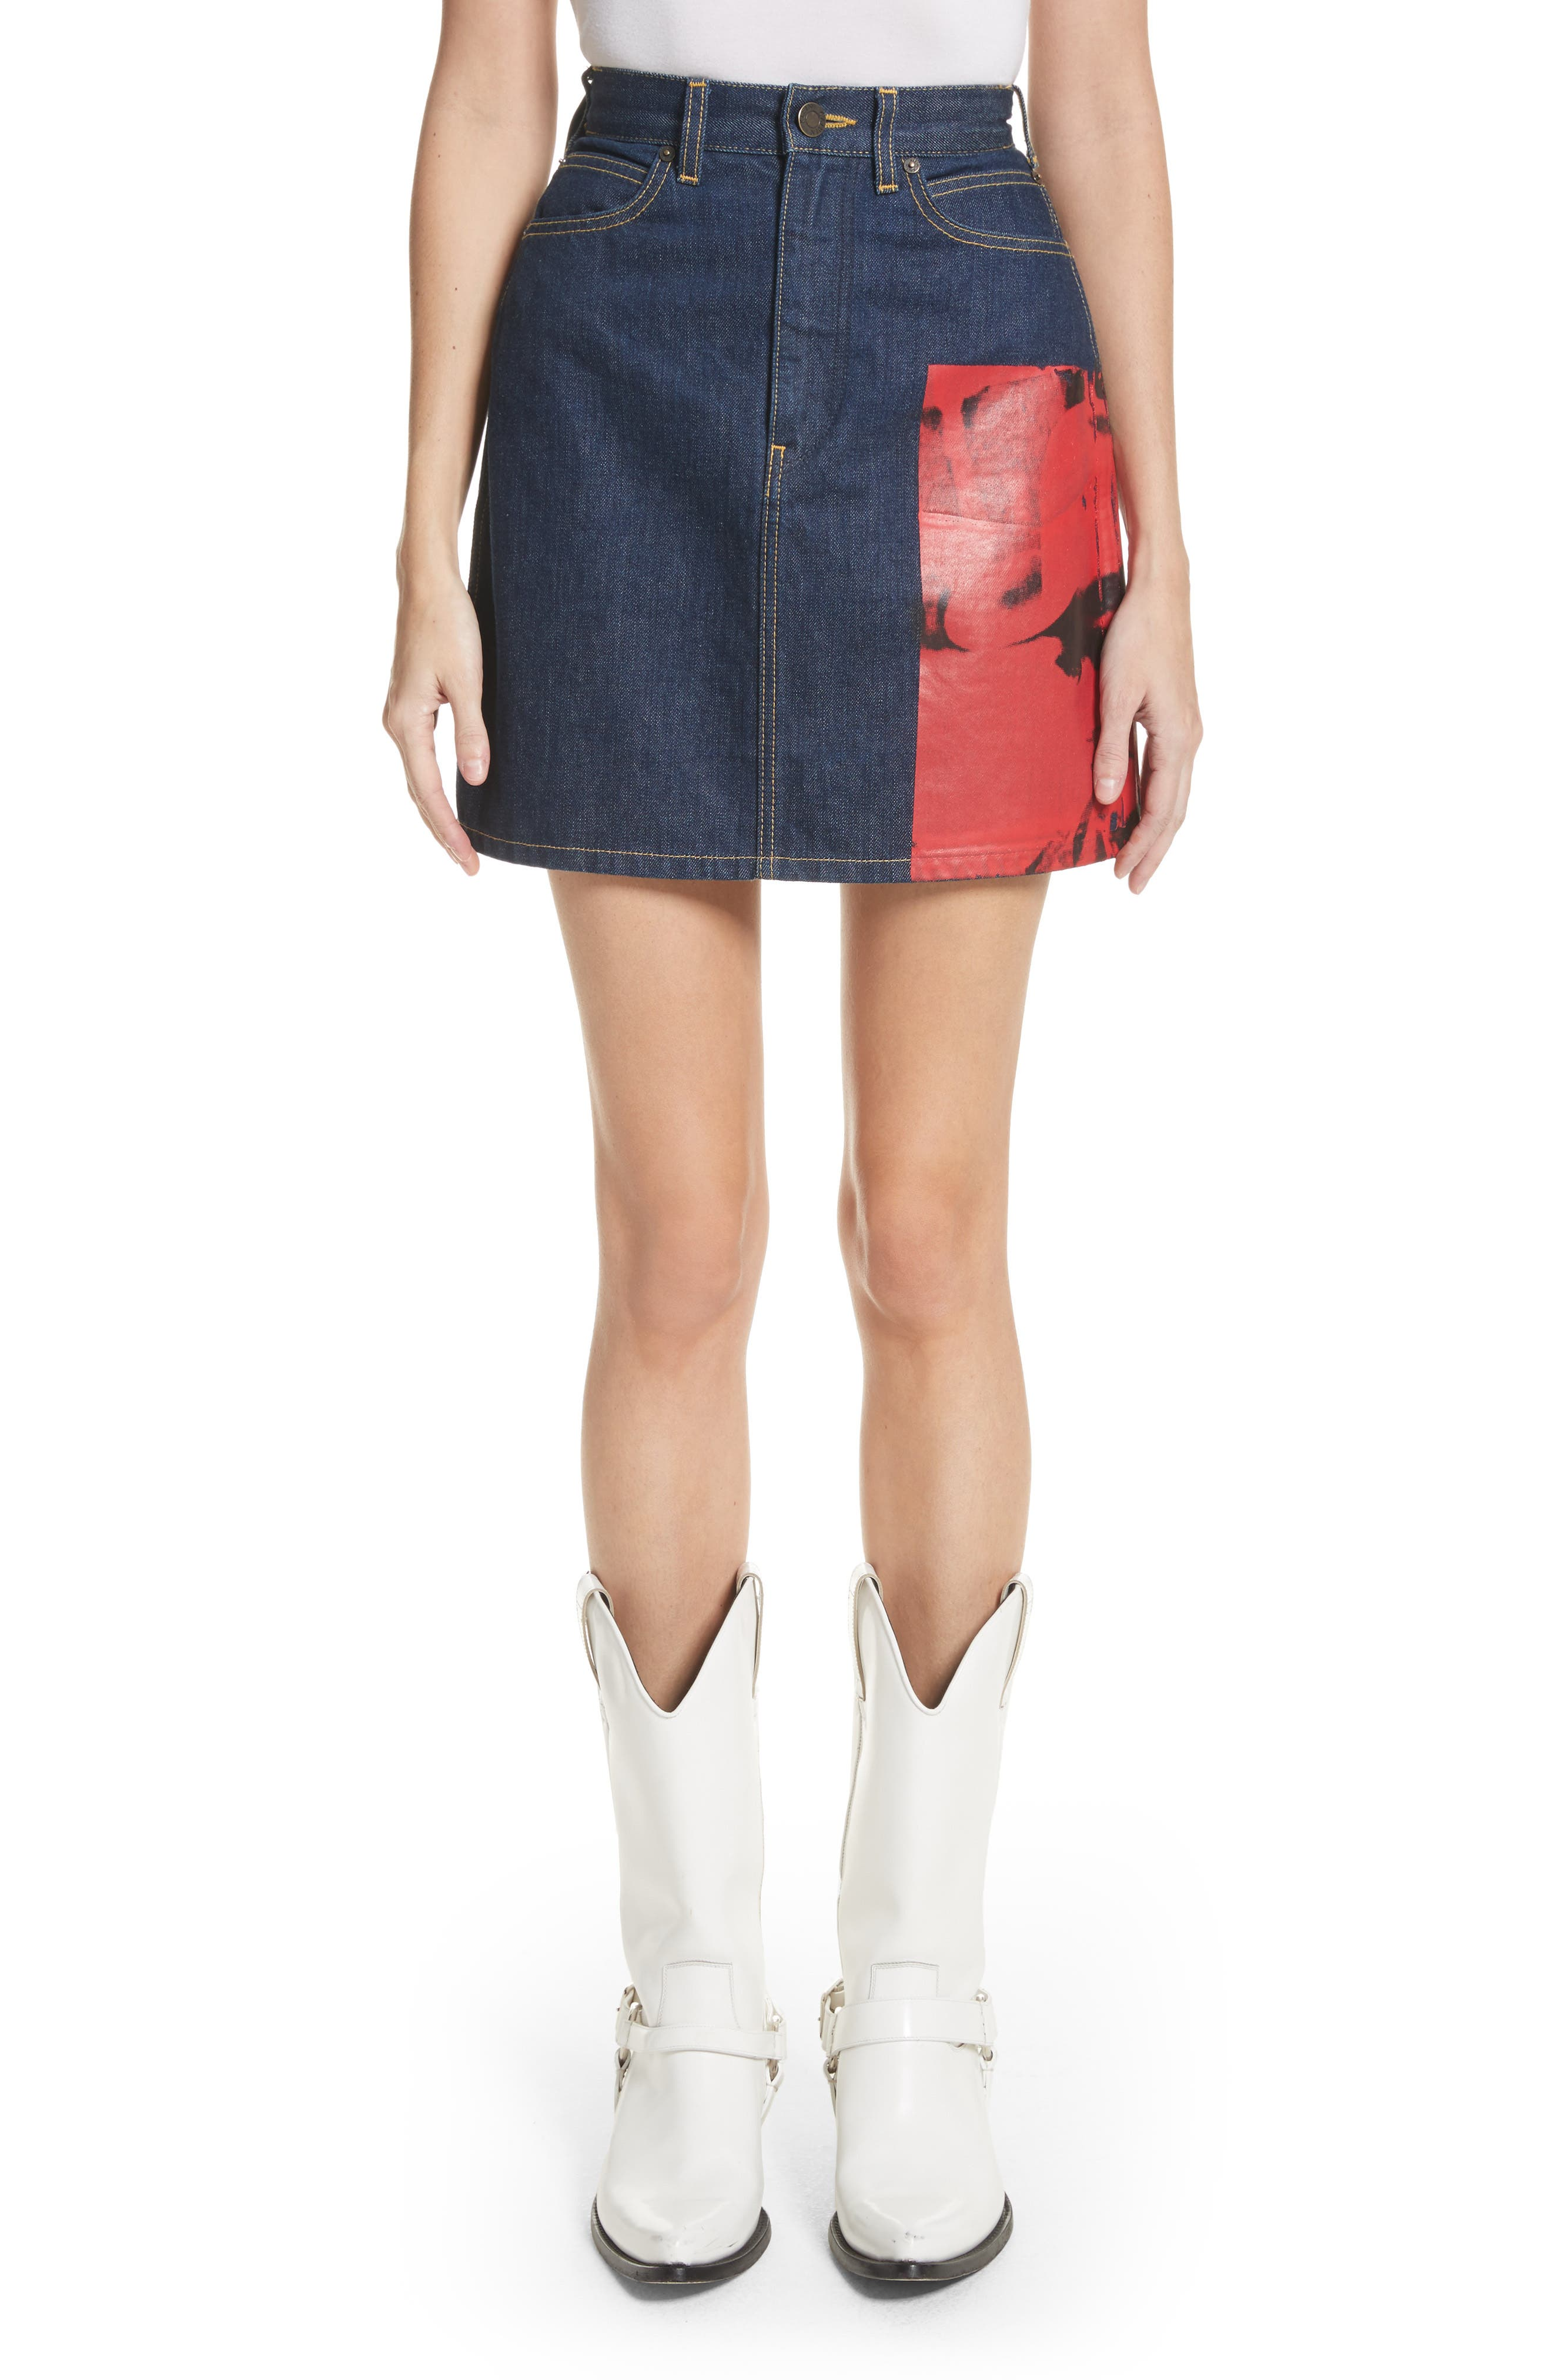 Main Image - CALVIN KLEIN 205W39NYC x Andy Warhol Foundation Dennis Hopper Denim Skirt